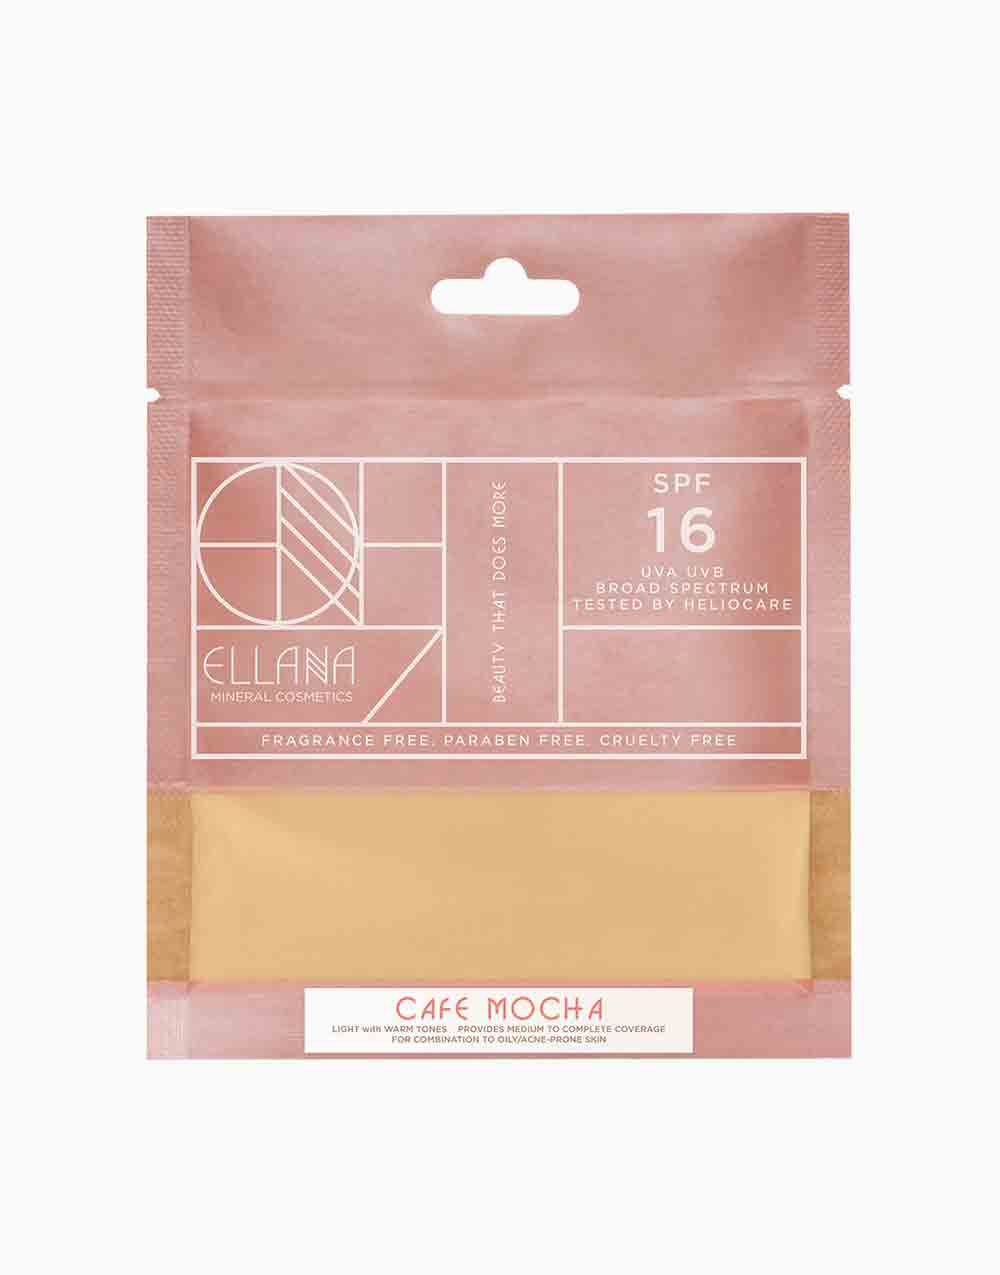 Loose Mineral Foundation Refill by Ellana Mineral Cosmetics | Café Mocha